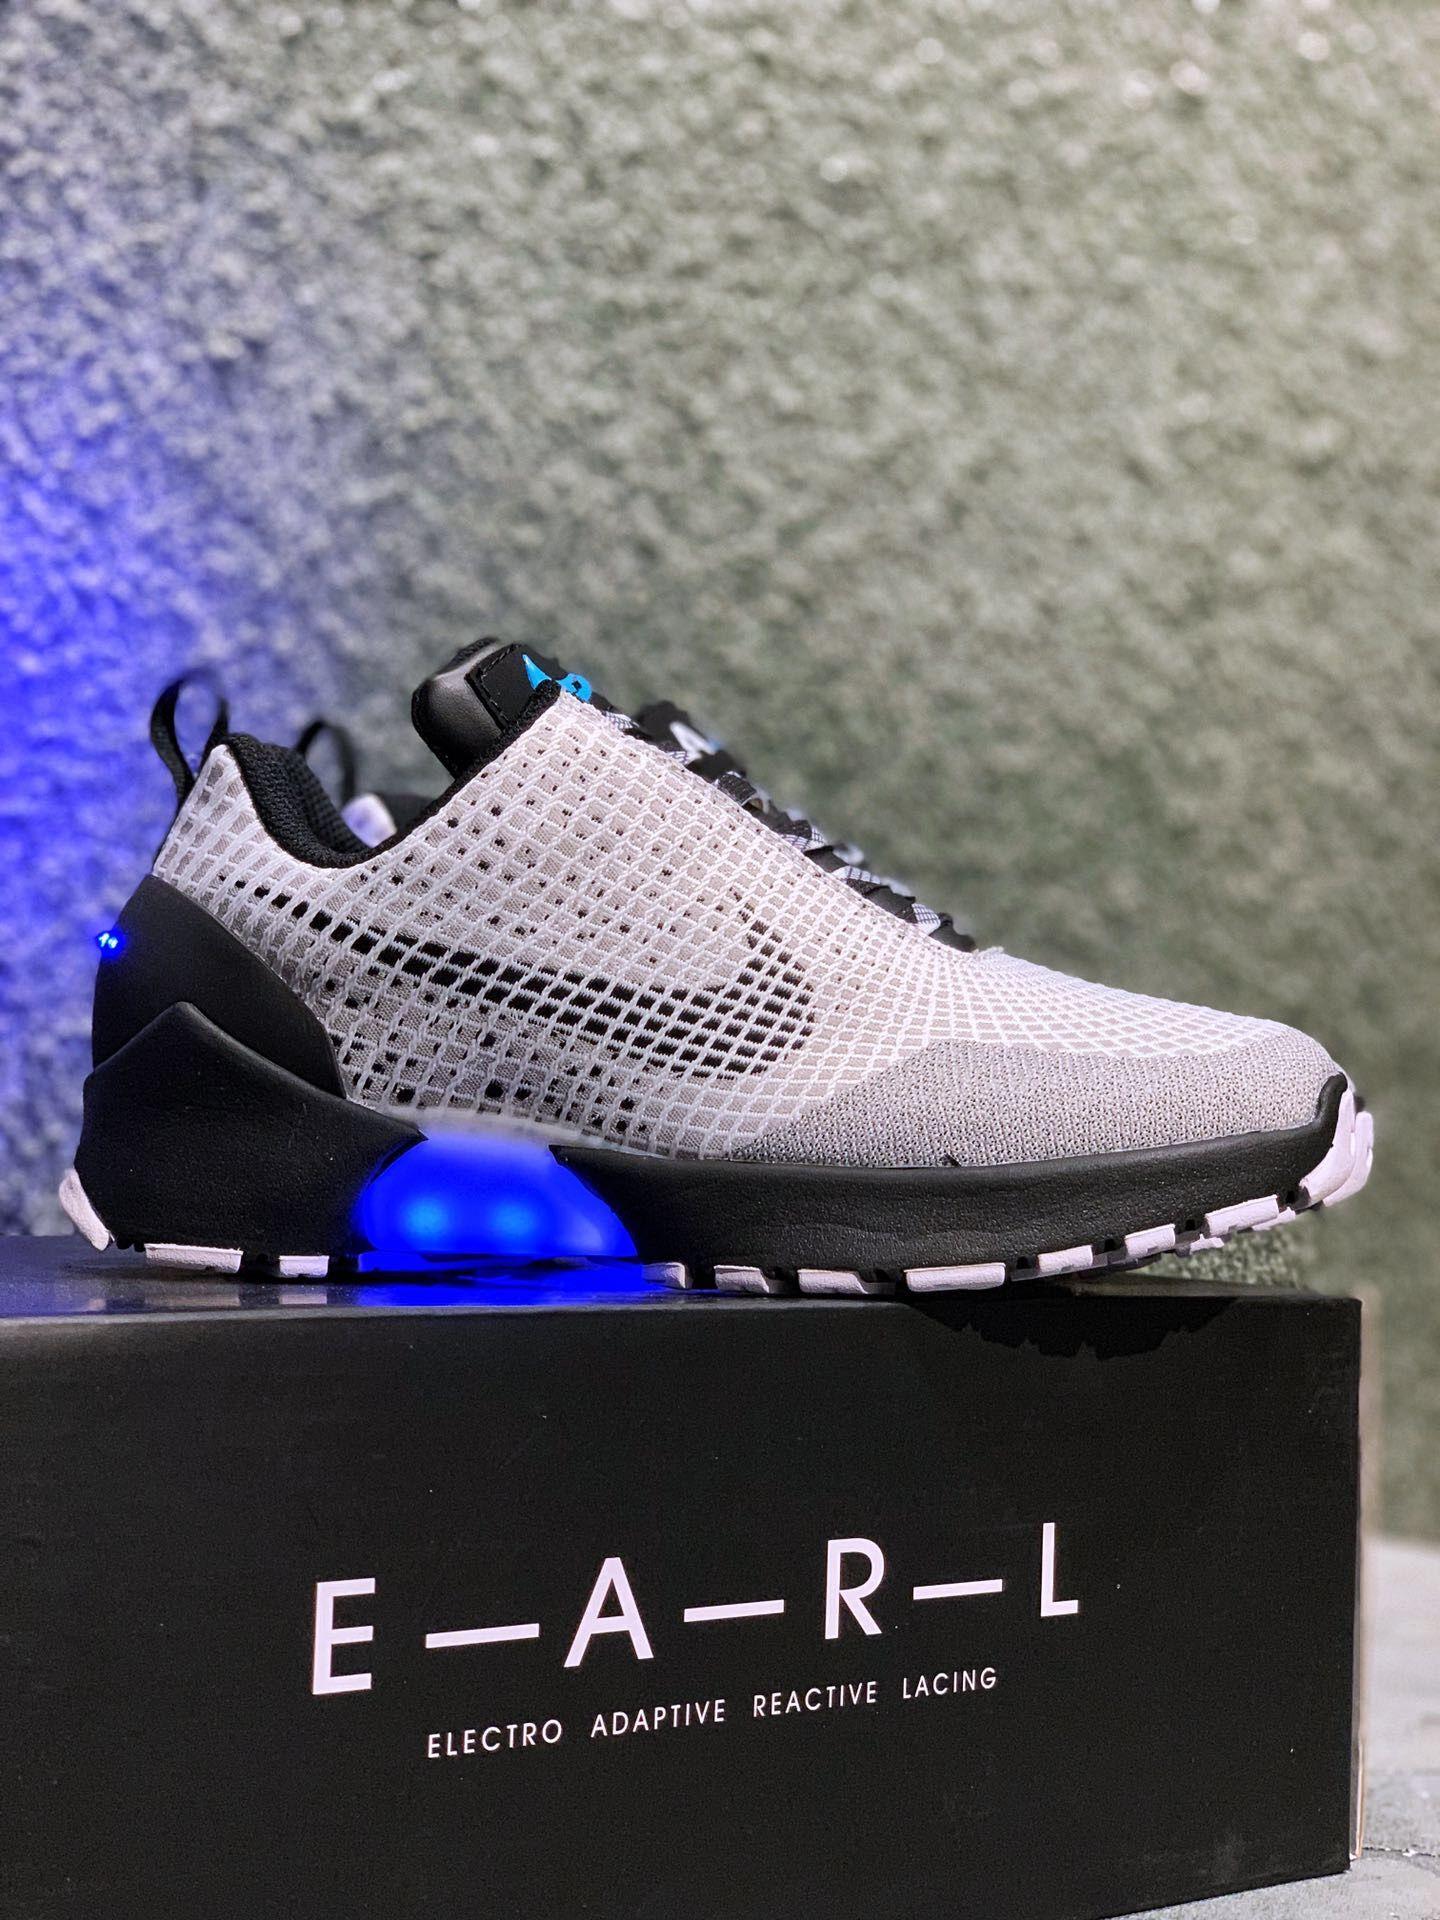 MT2.0 NIKE E.A.R.L Nike Hyperadapt 1.0